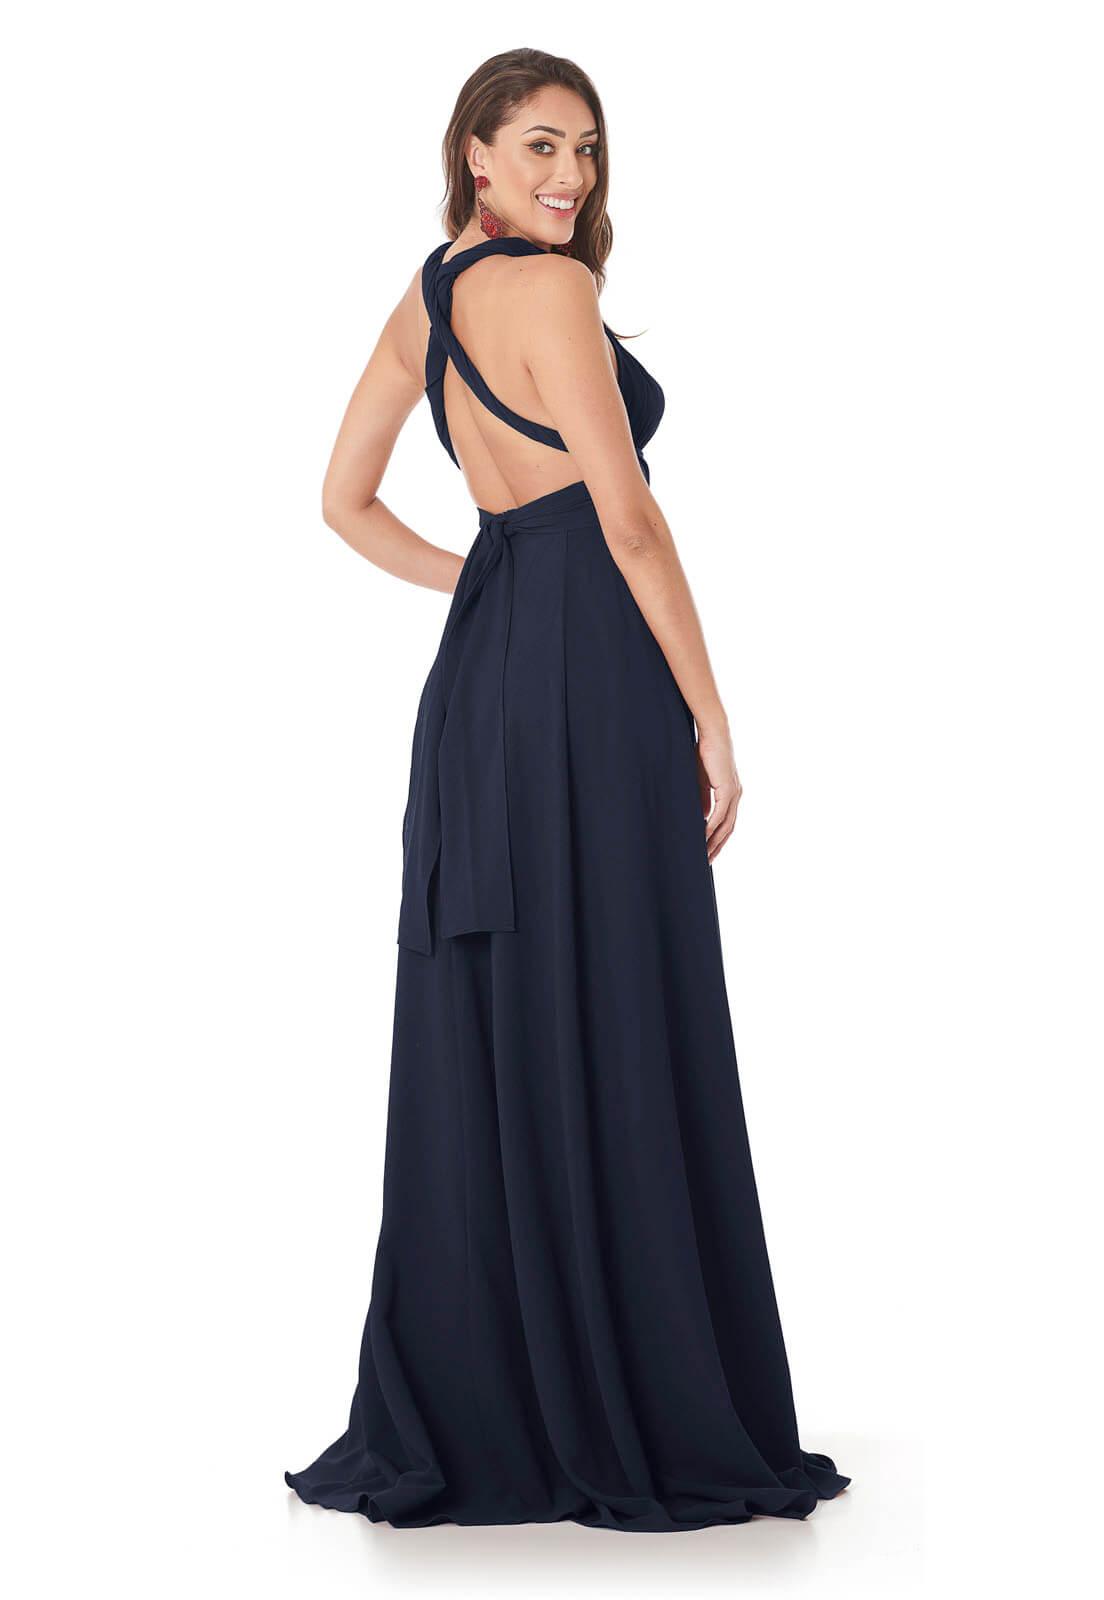 Vestido Longo Mil Formas Azul Marinho Lala Dubi